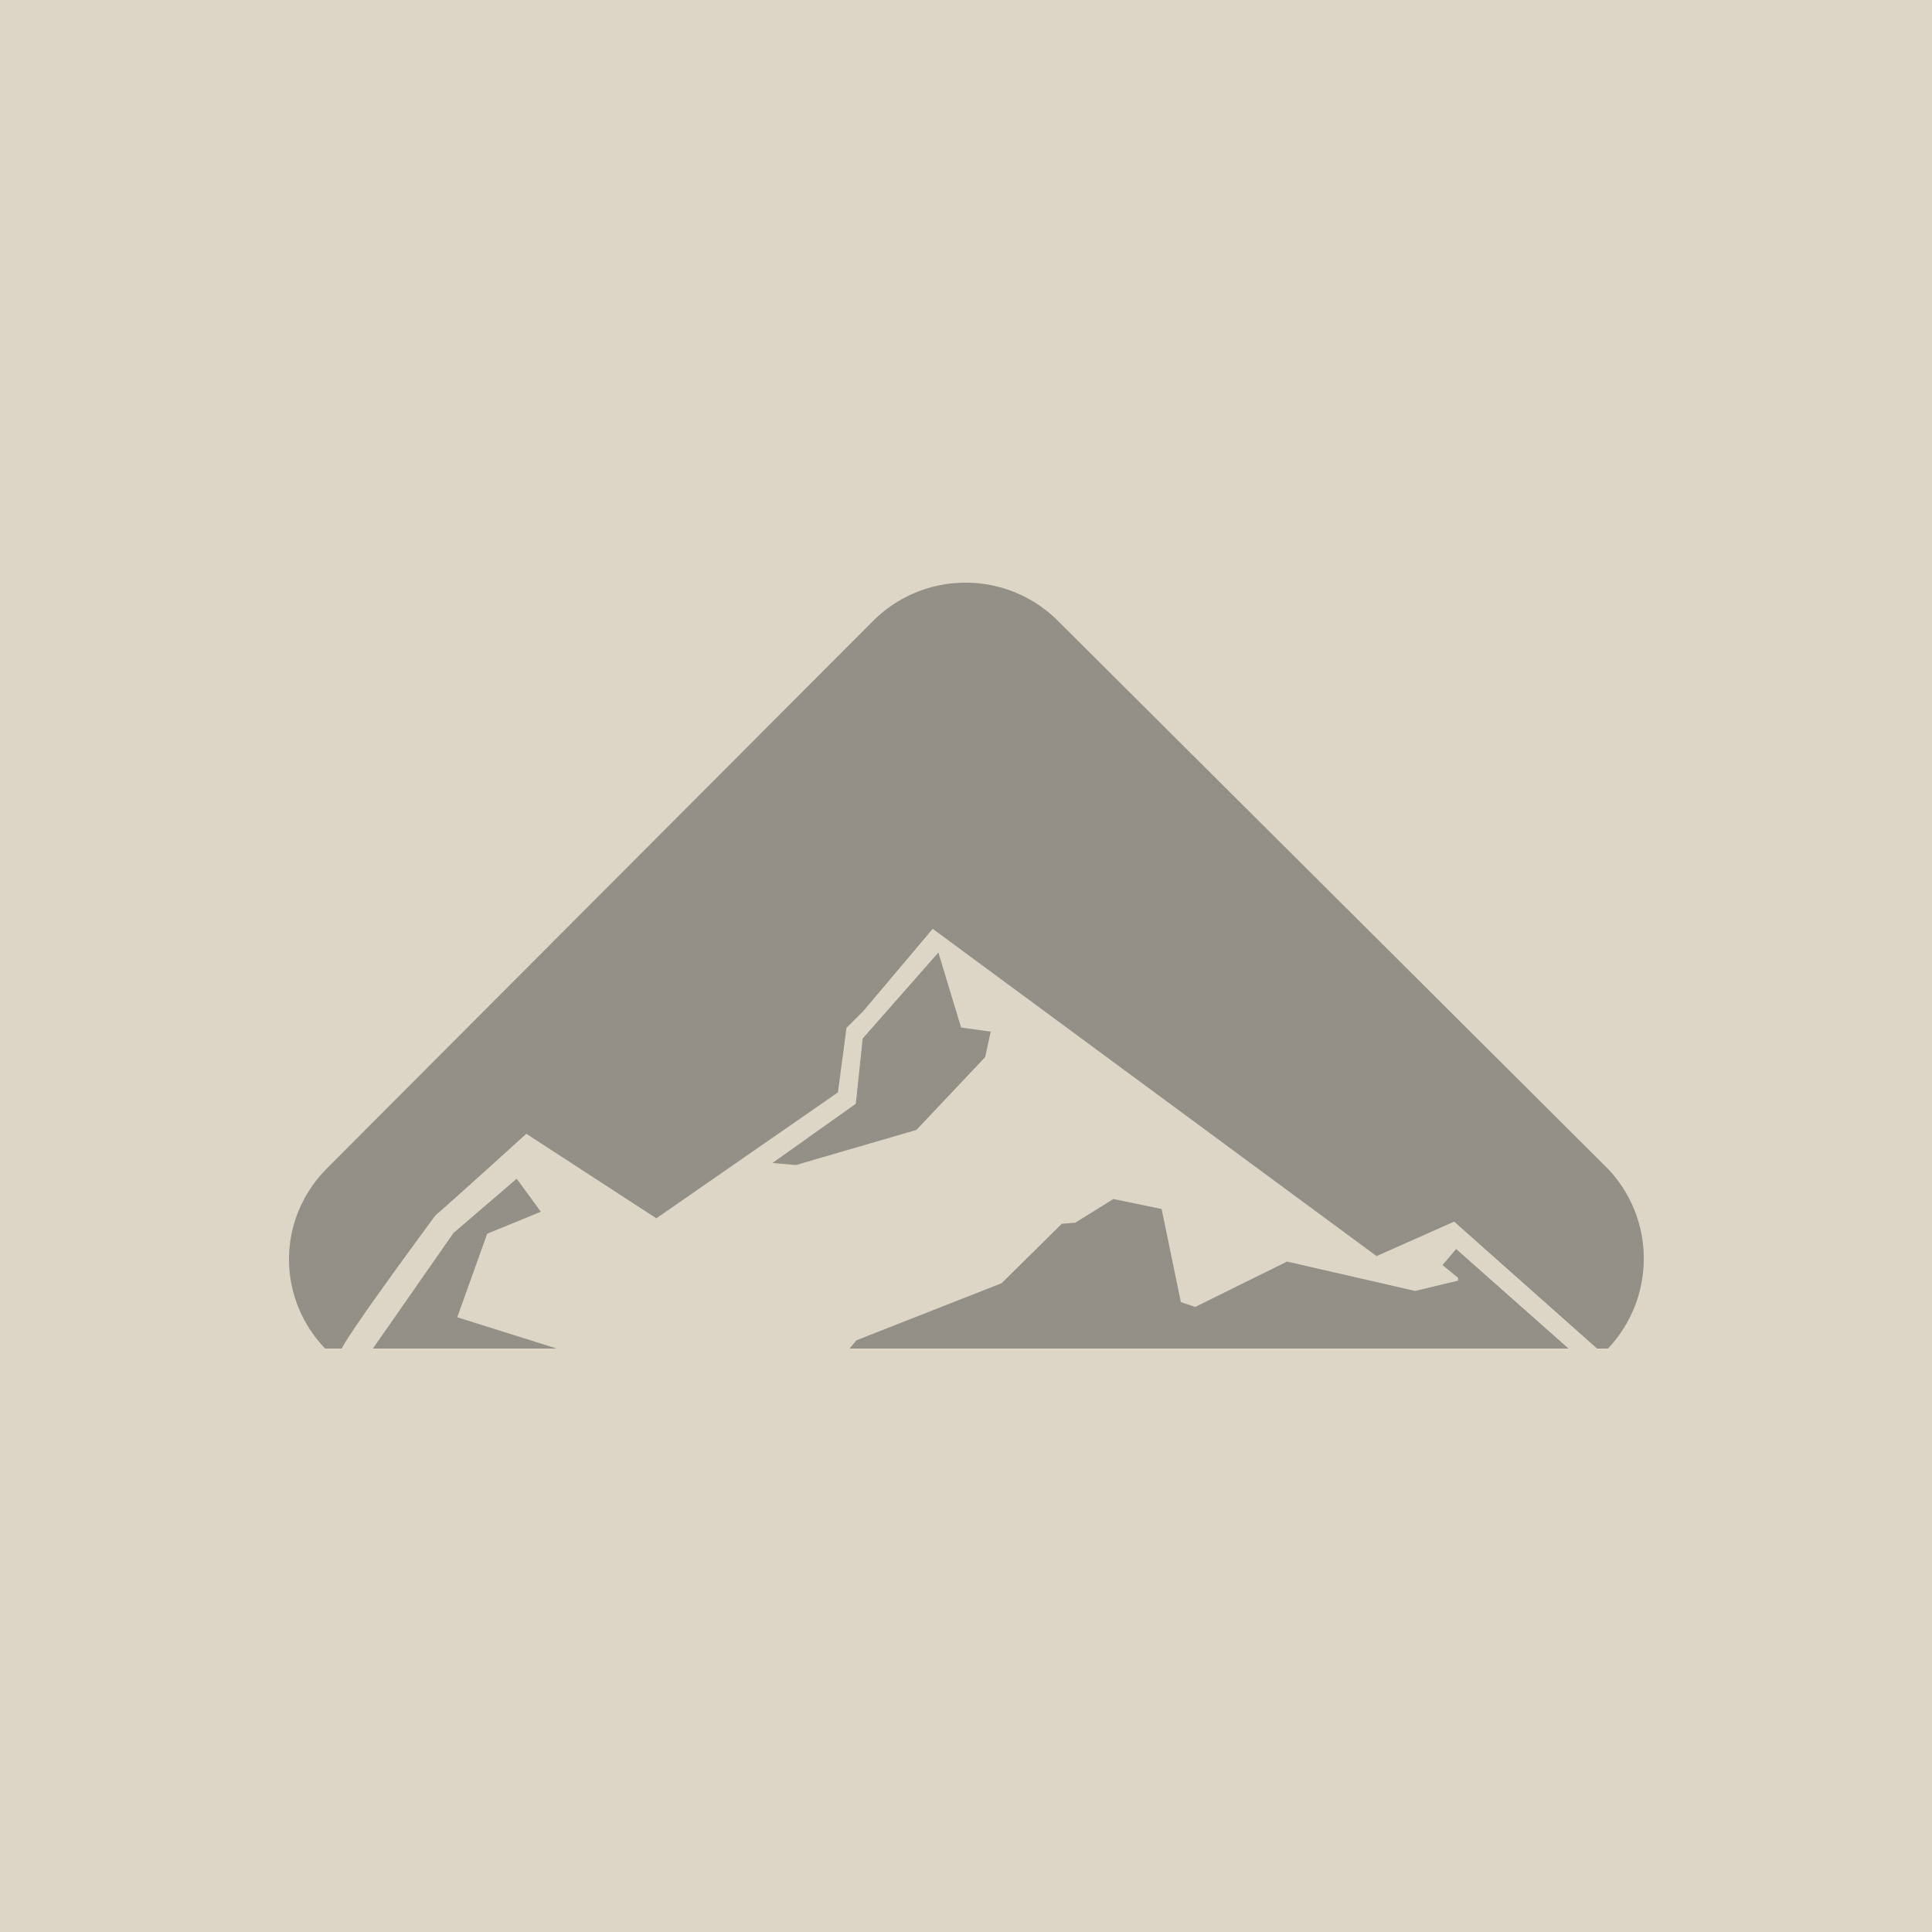 logos_0026_mountain.jpg